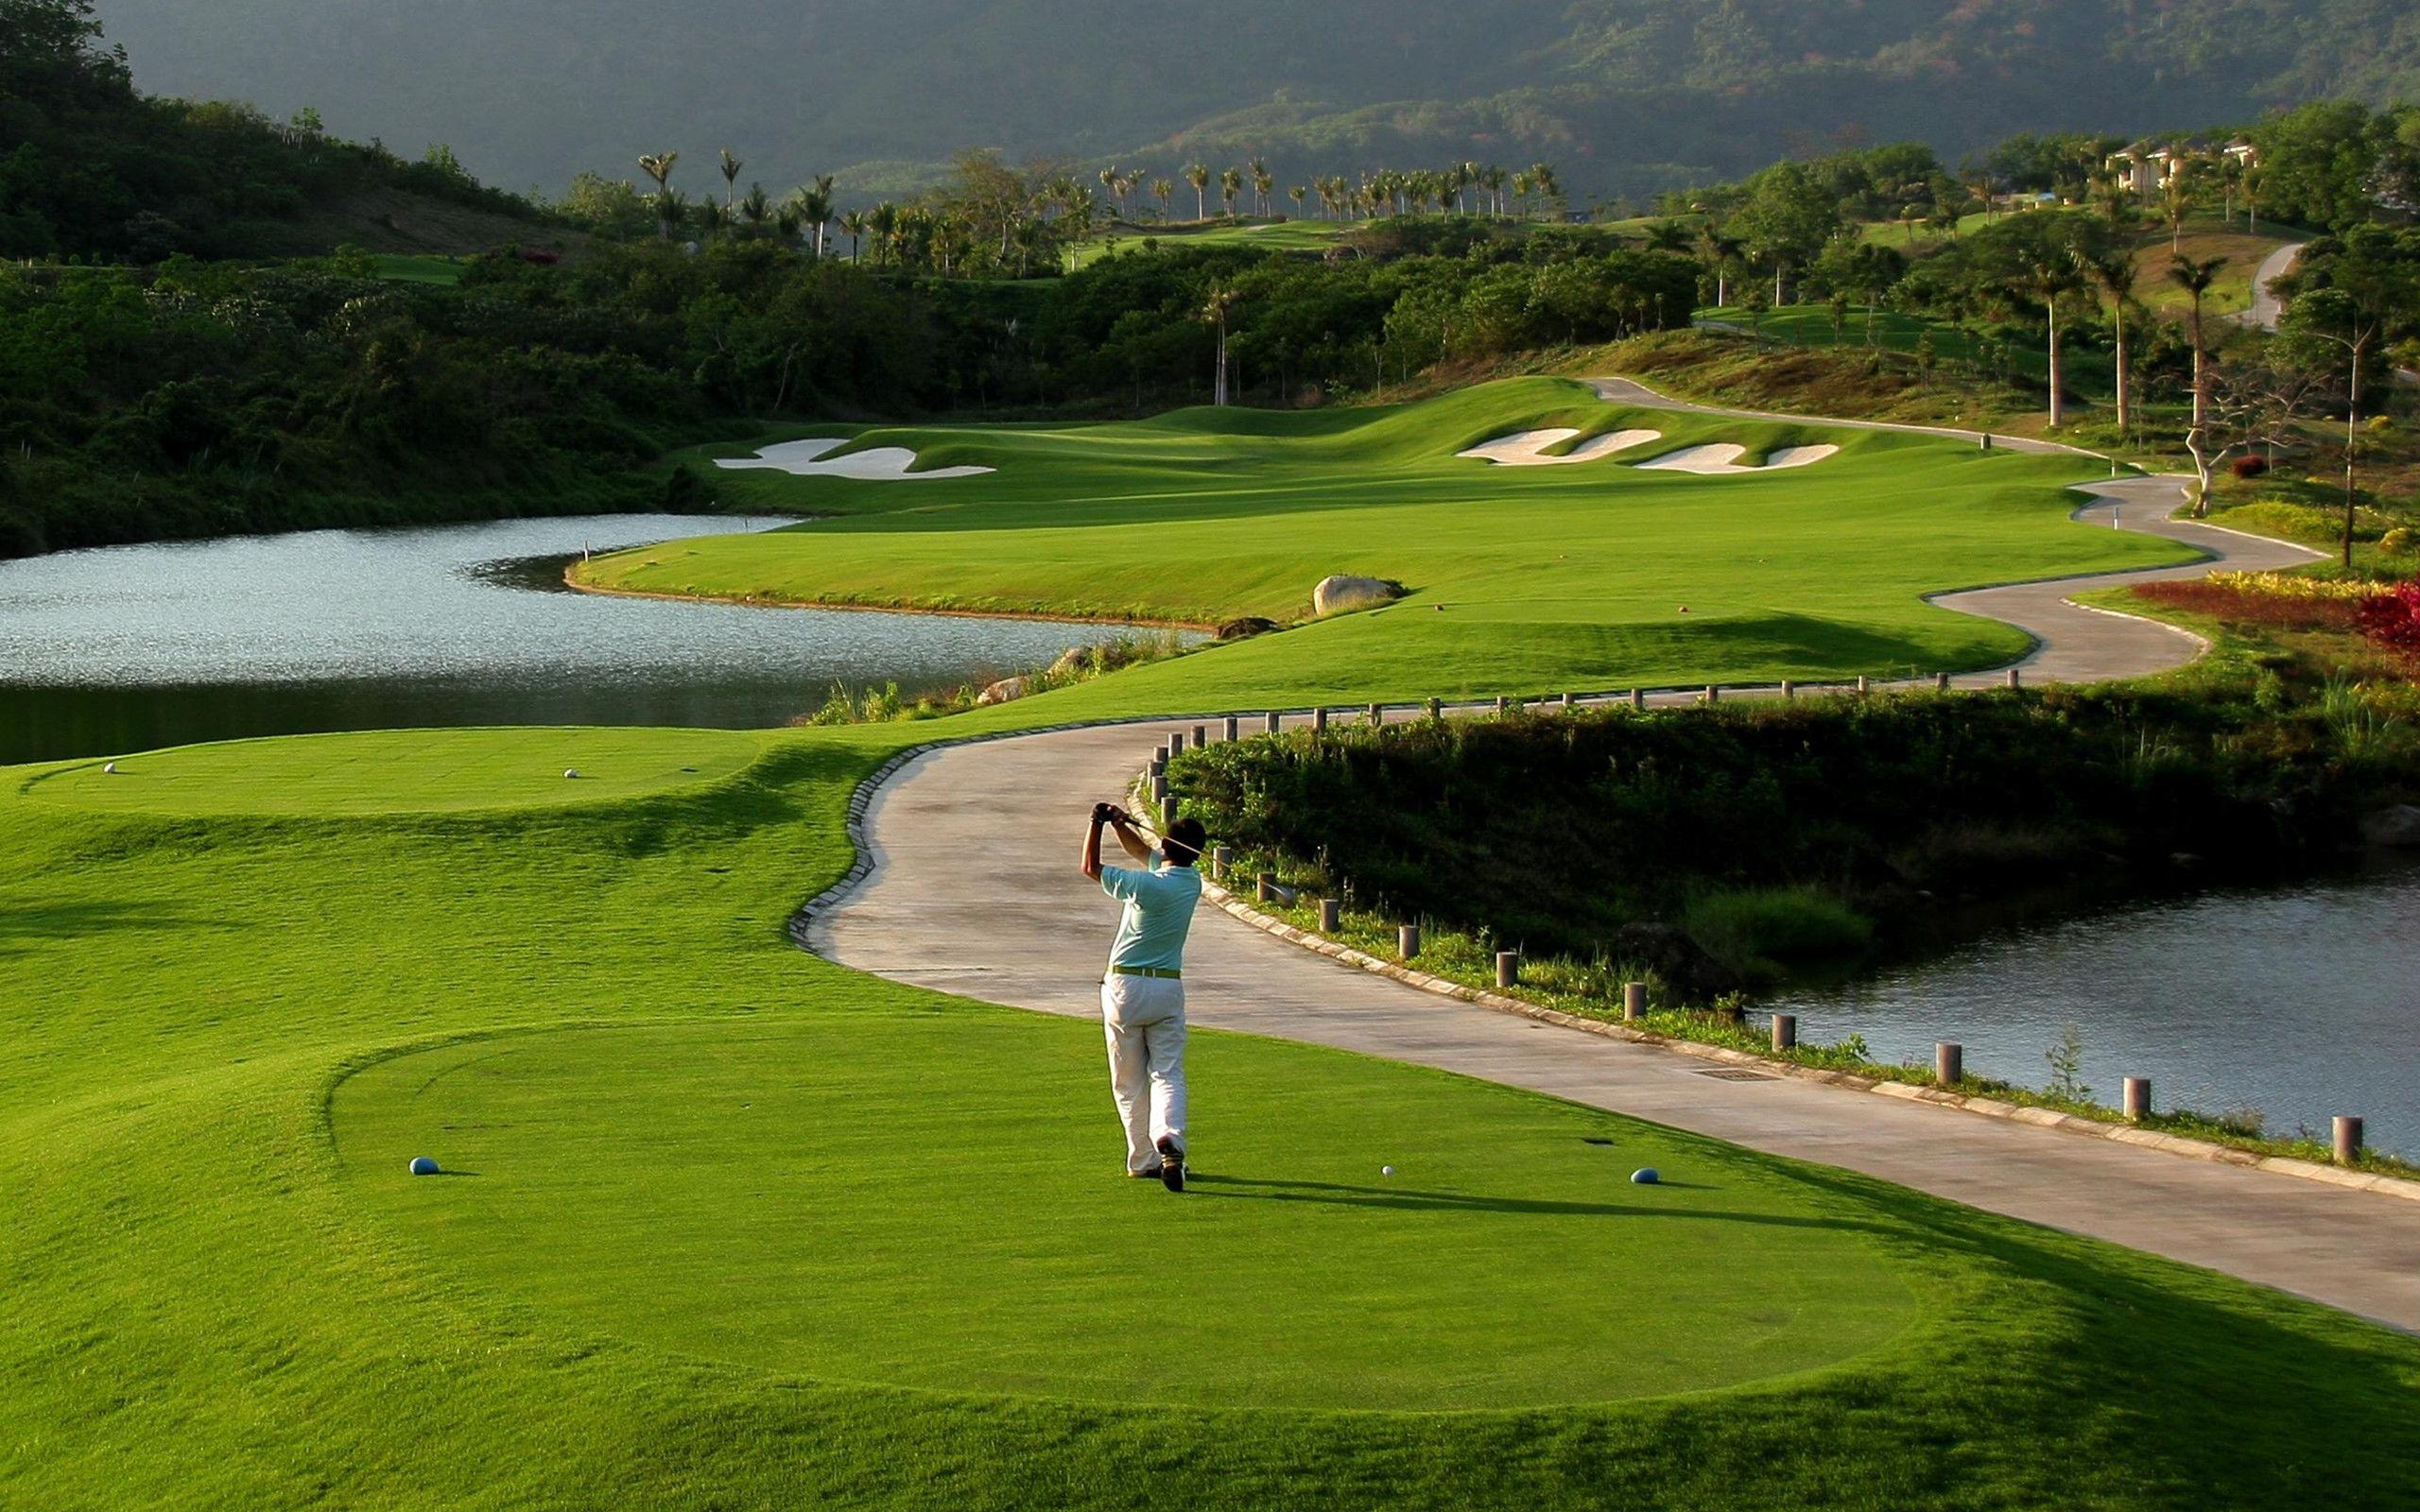 Hd golf desktop wallpaper wallpapersafari - Golf wallpaper hd ...